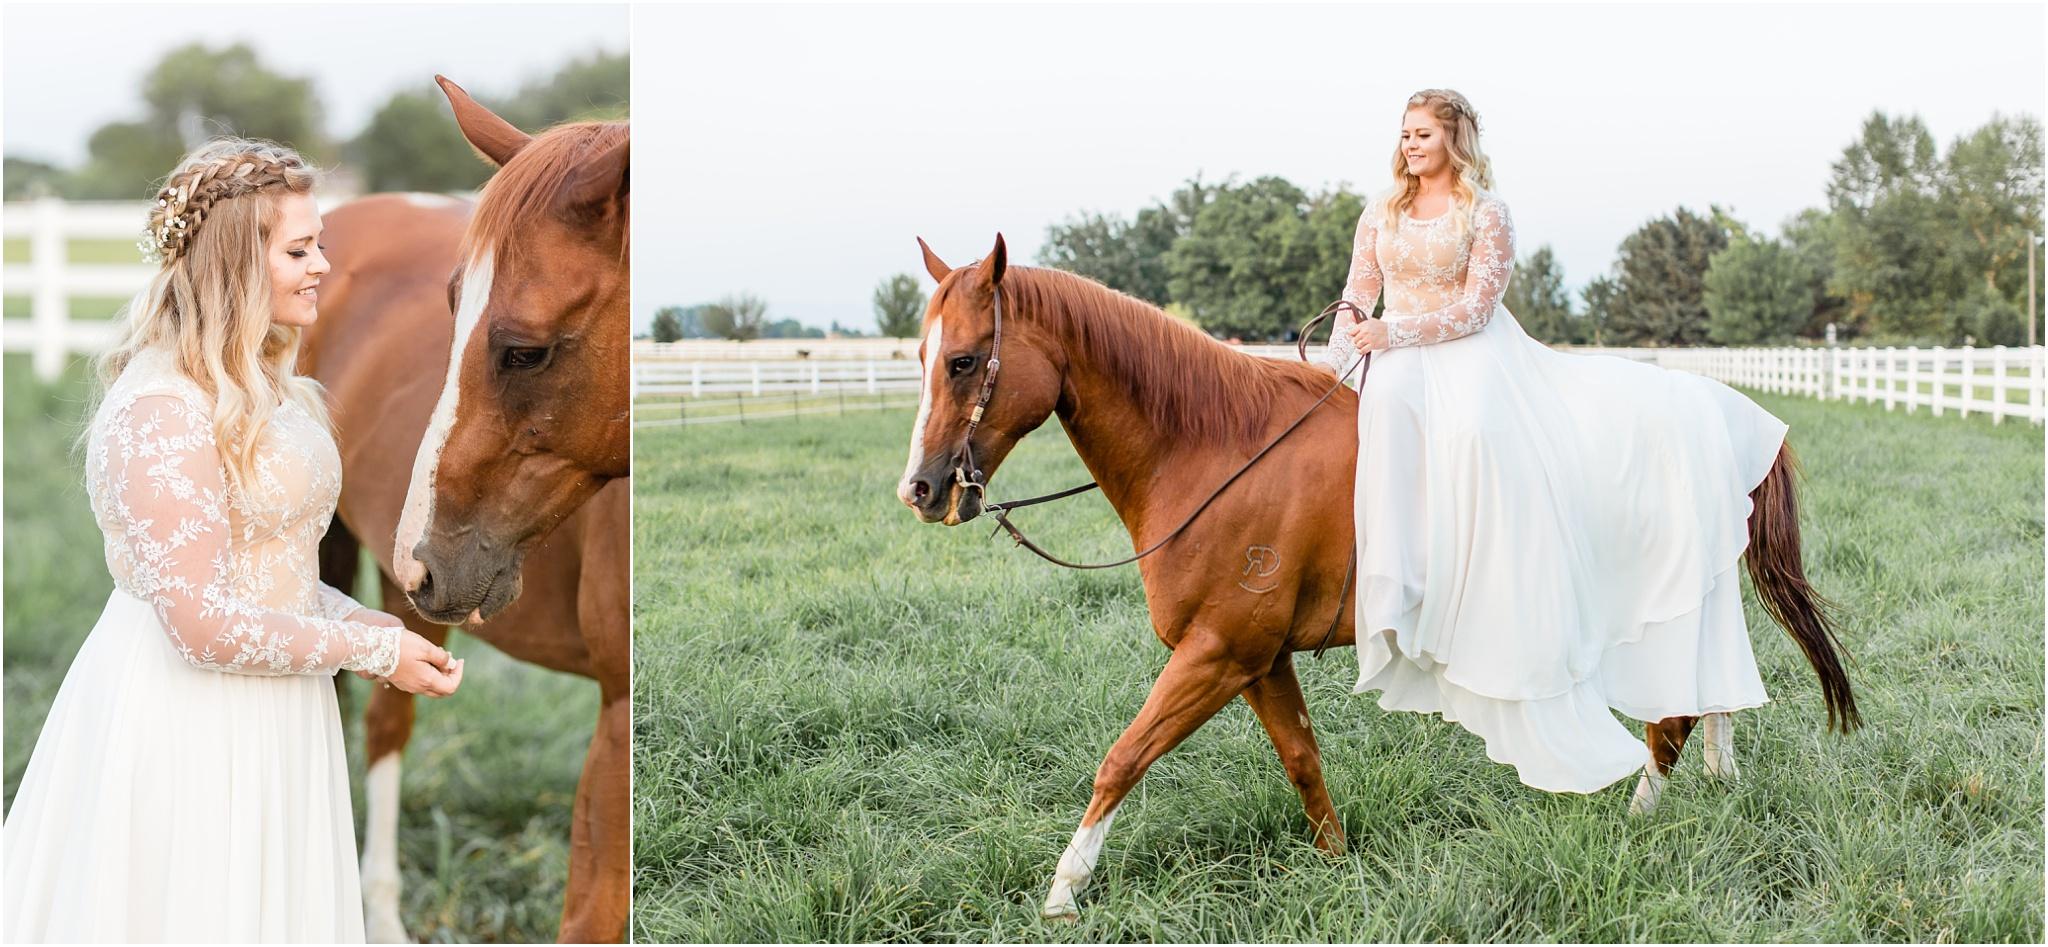 Wedding Photography_Meridian Idaho Temple_Boise Idaho_Nampa Idaho_Leah Southwick Photography_0025.jpg